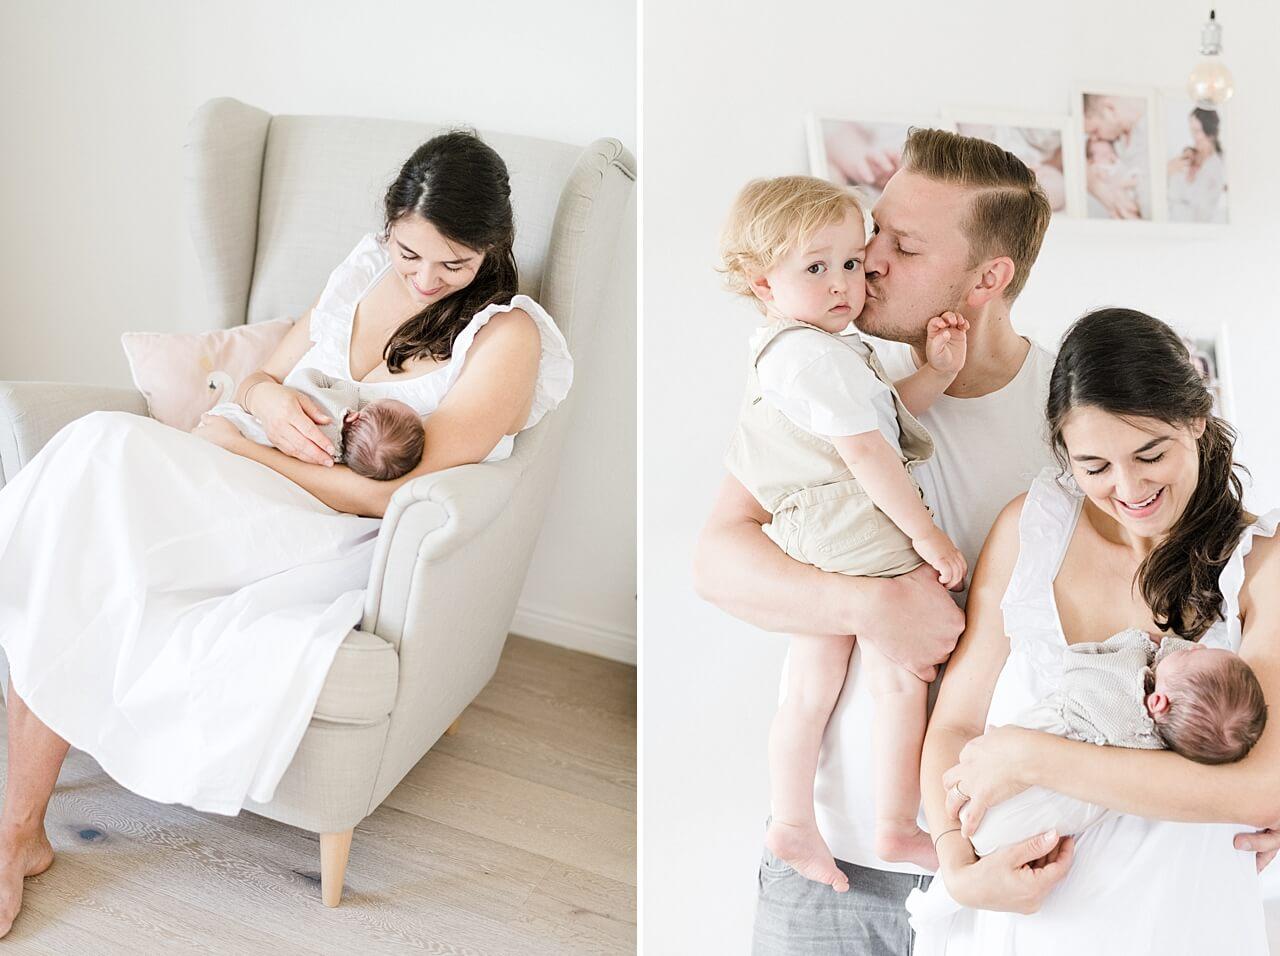 Rebecca Conte Fotografie: Zarte Neugeborenenbilder 15